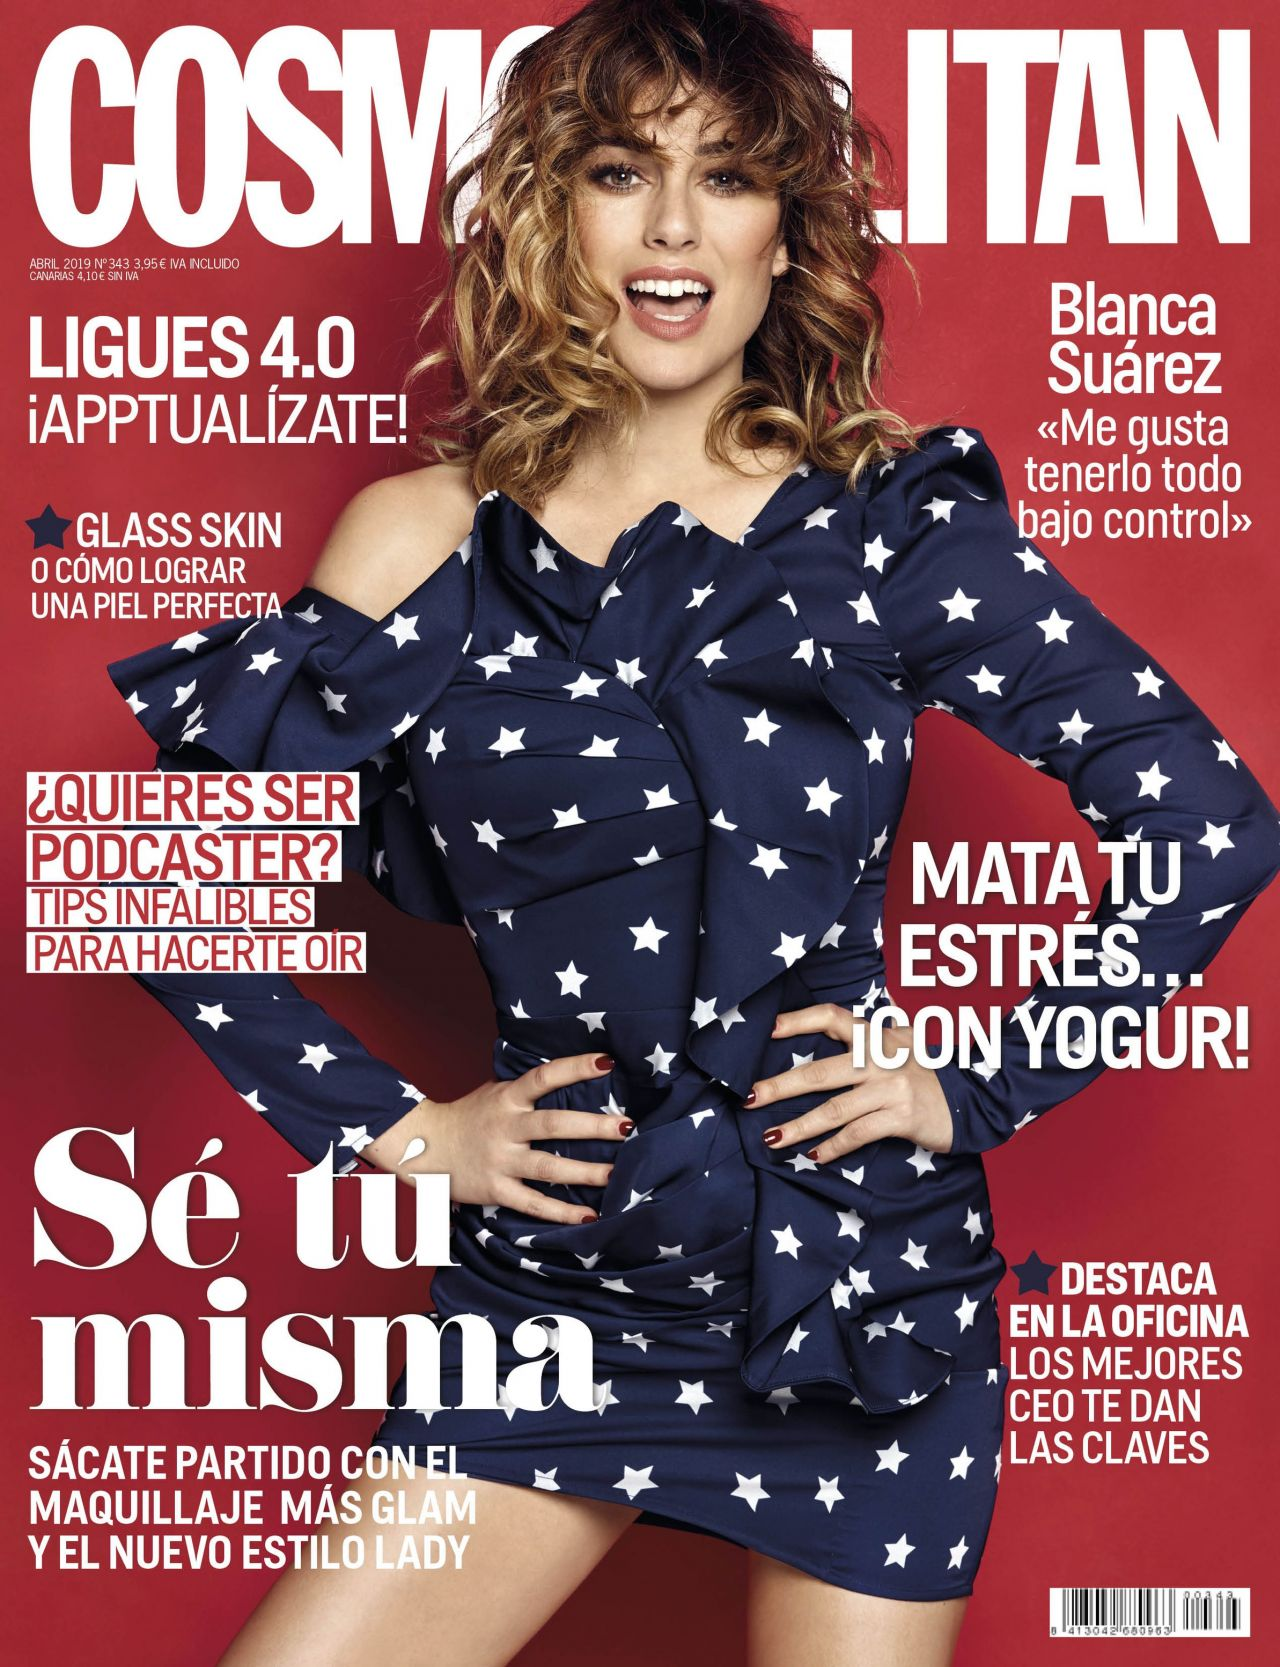 Cosmopolitan Blanca Suarez Gewichtsverlust